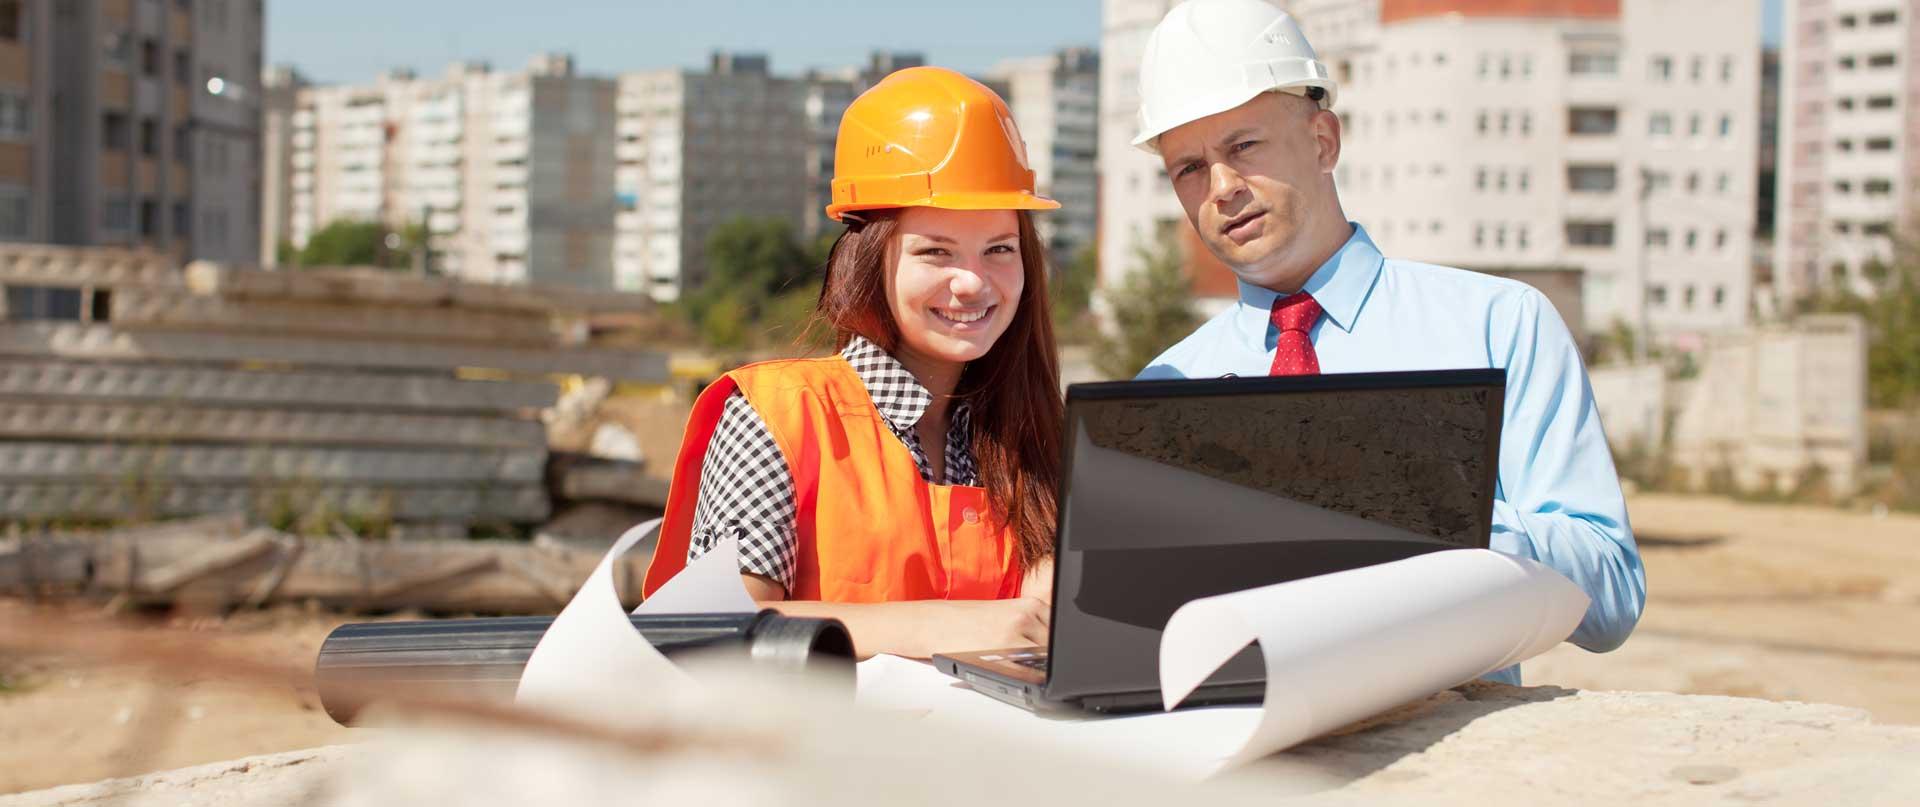 leading construction companies in trivandrum